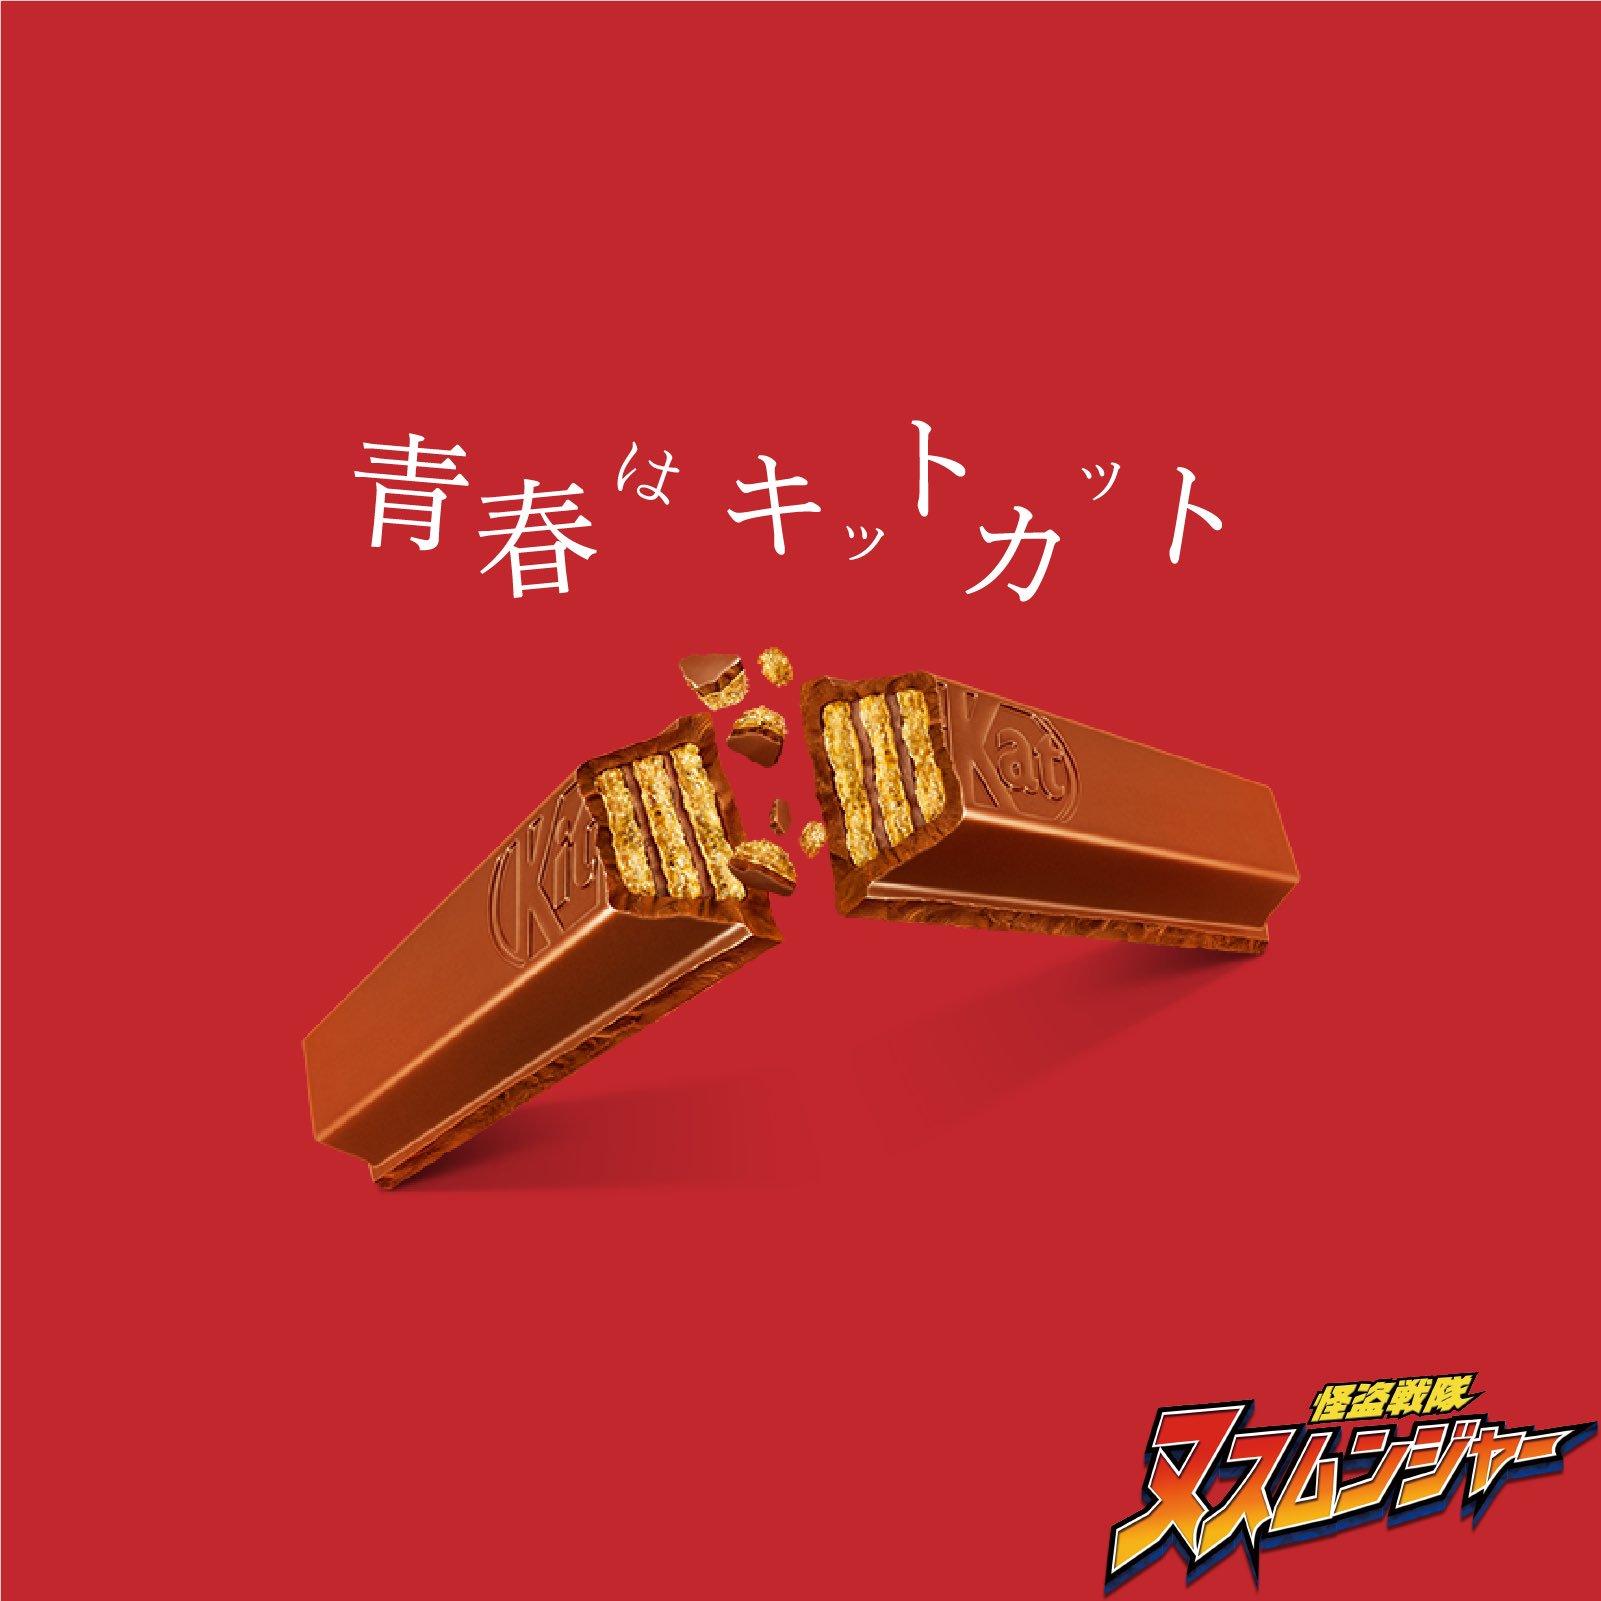 April fools kaitou sentai new single dzobzb6uqaa0op9formatjpgnamelarge voltagebd Gallery